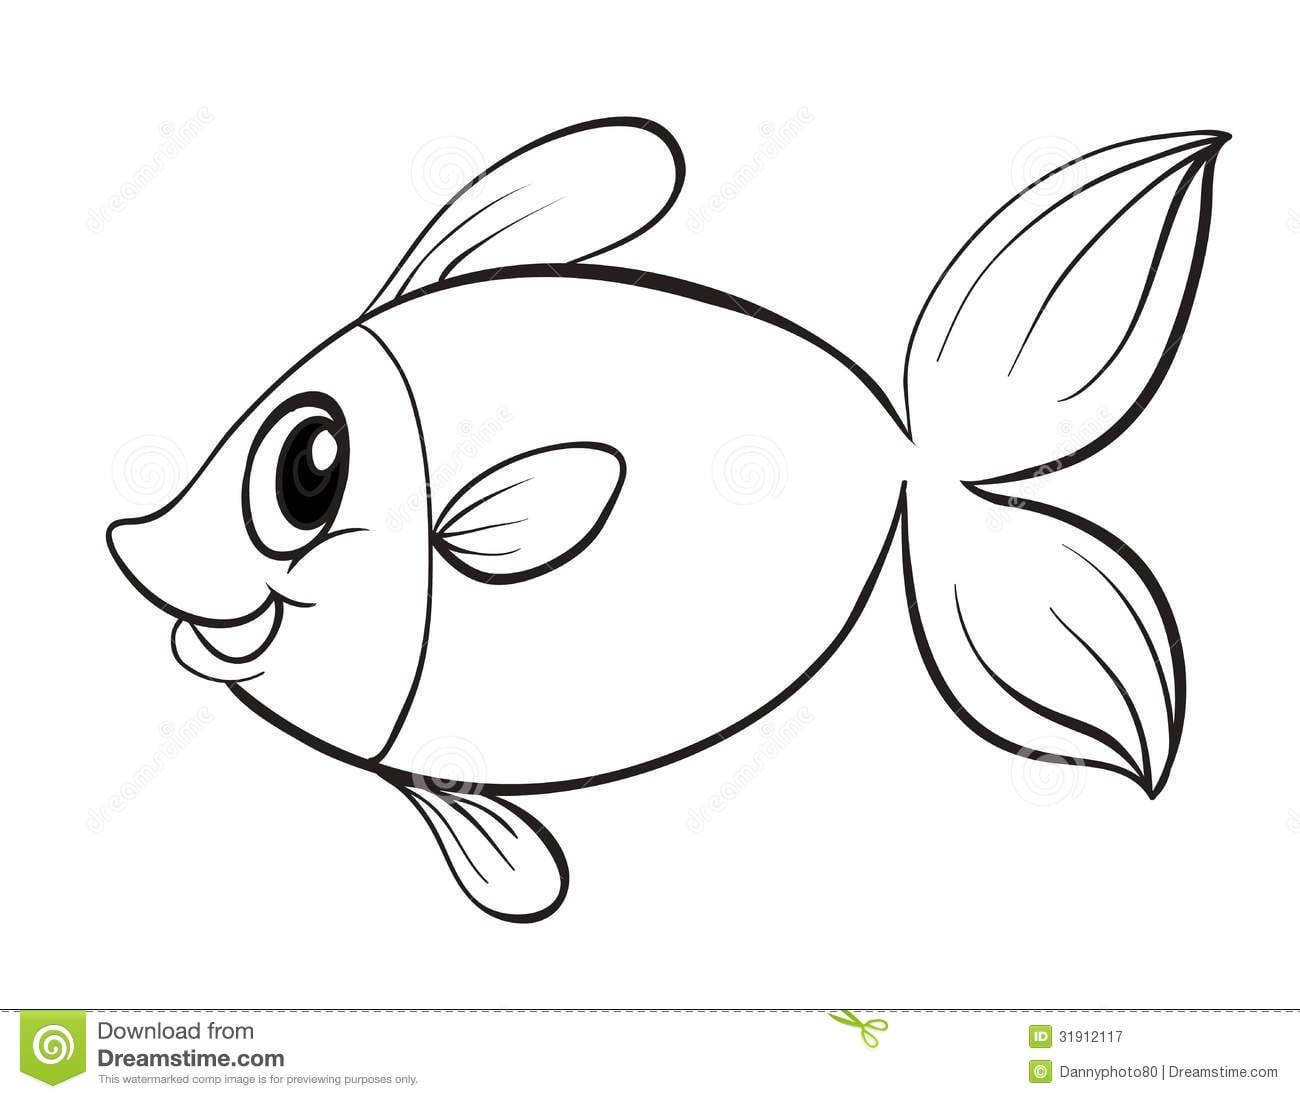 Desenhos De Peixes Para Colorir Imagens Para Colorir